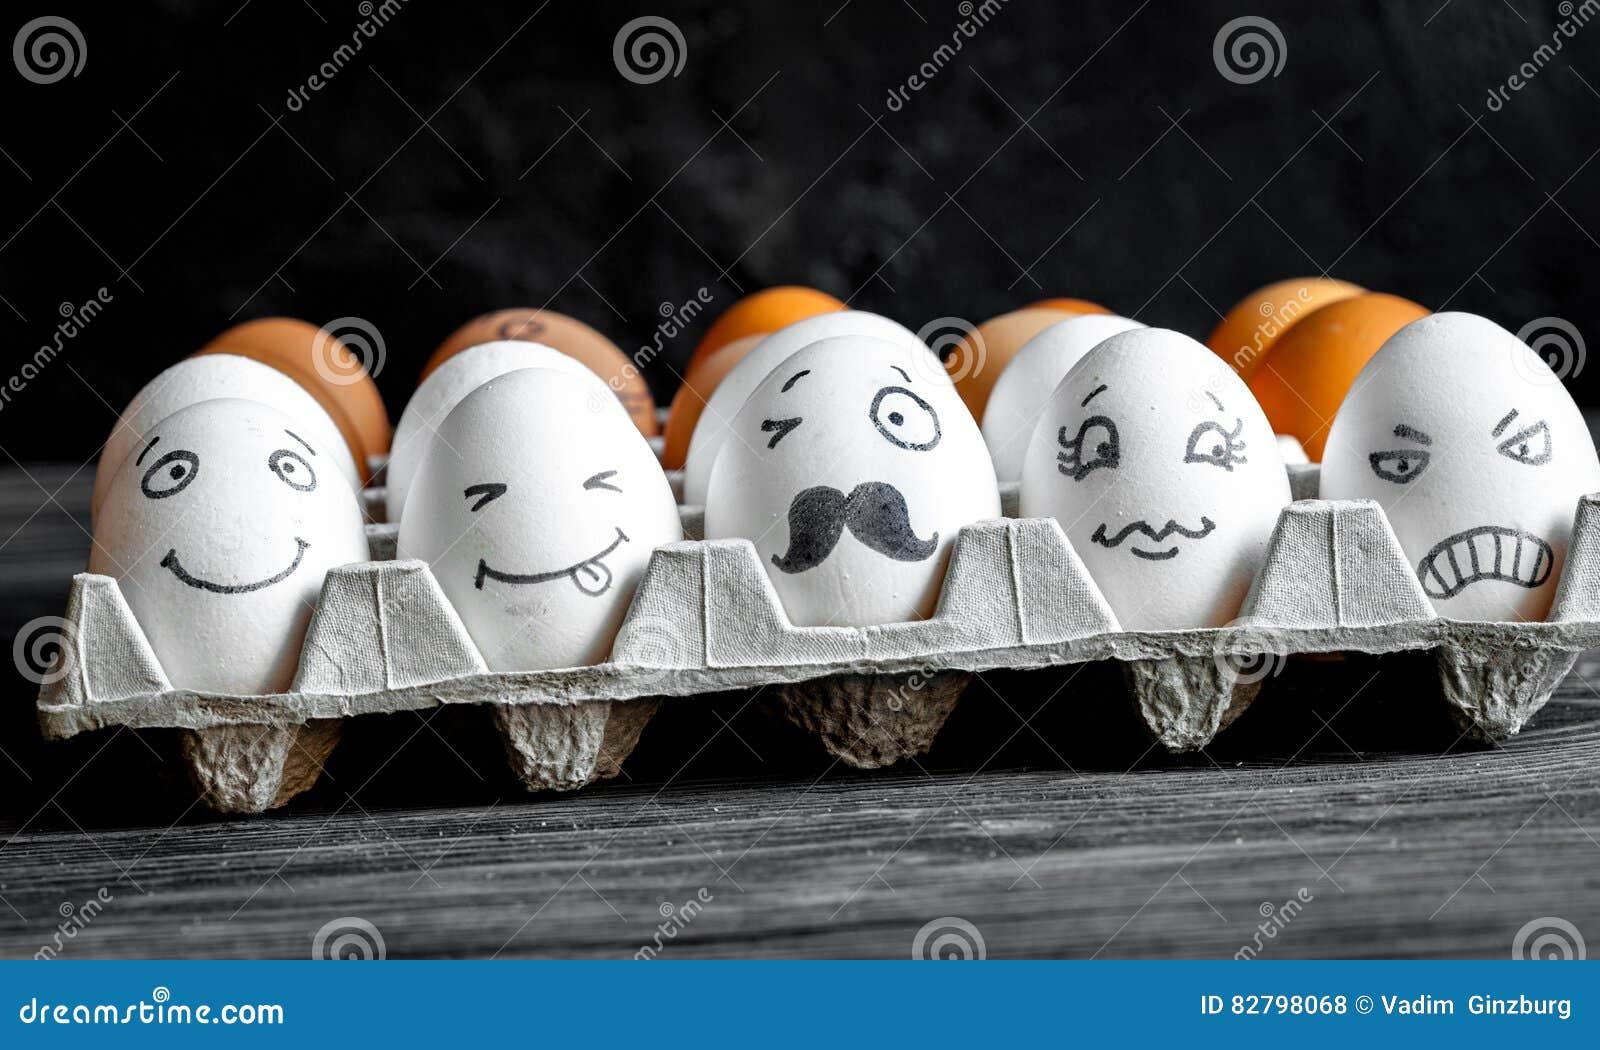 Pojęcie sieci ogólnospołeczna komunikacja i emocje - jajka mrugają